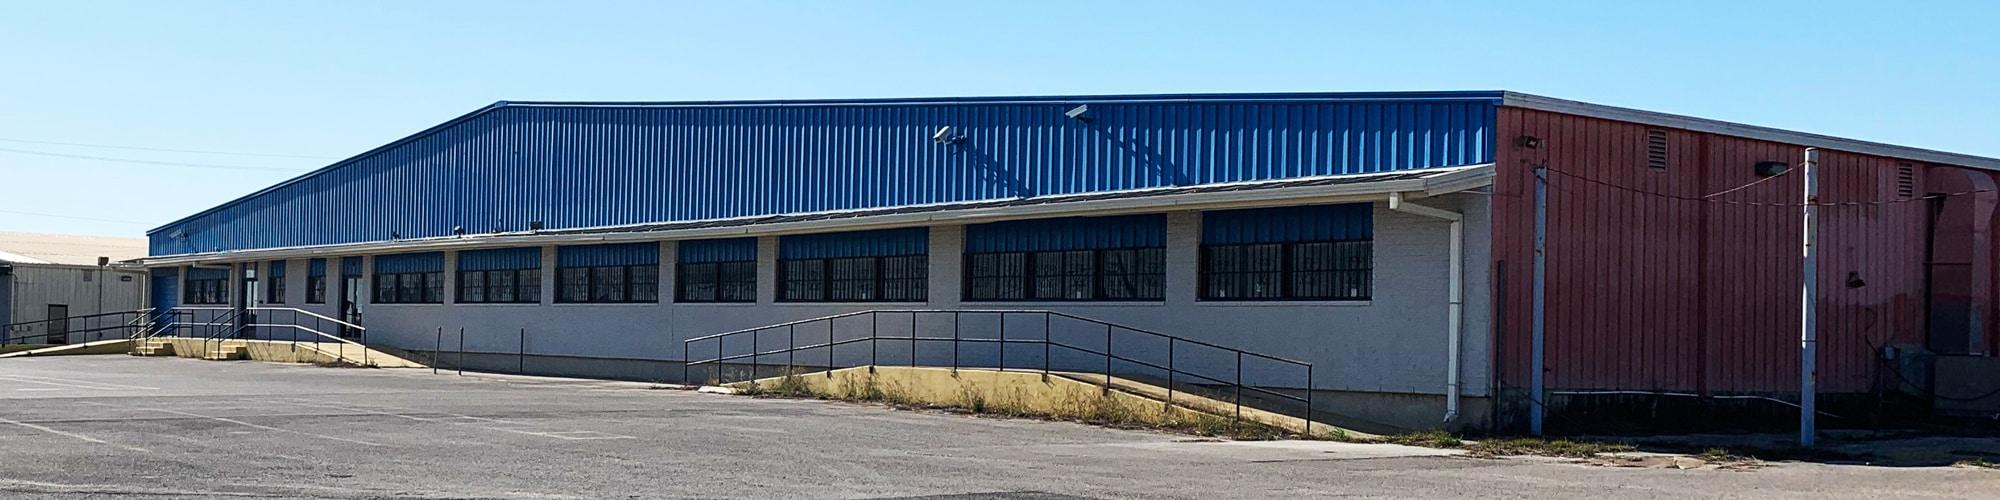 Schertz Corporate Center Existing Building